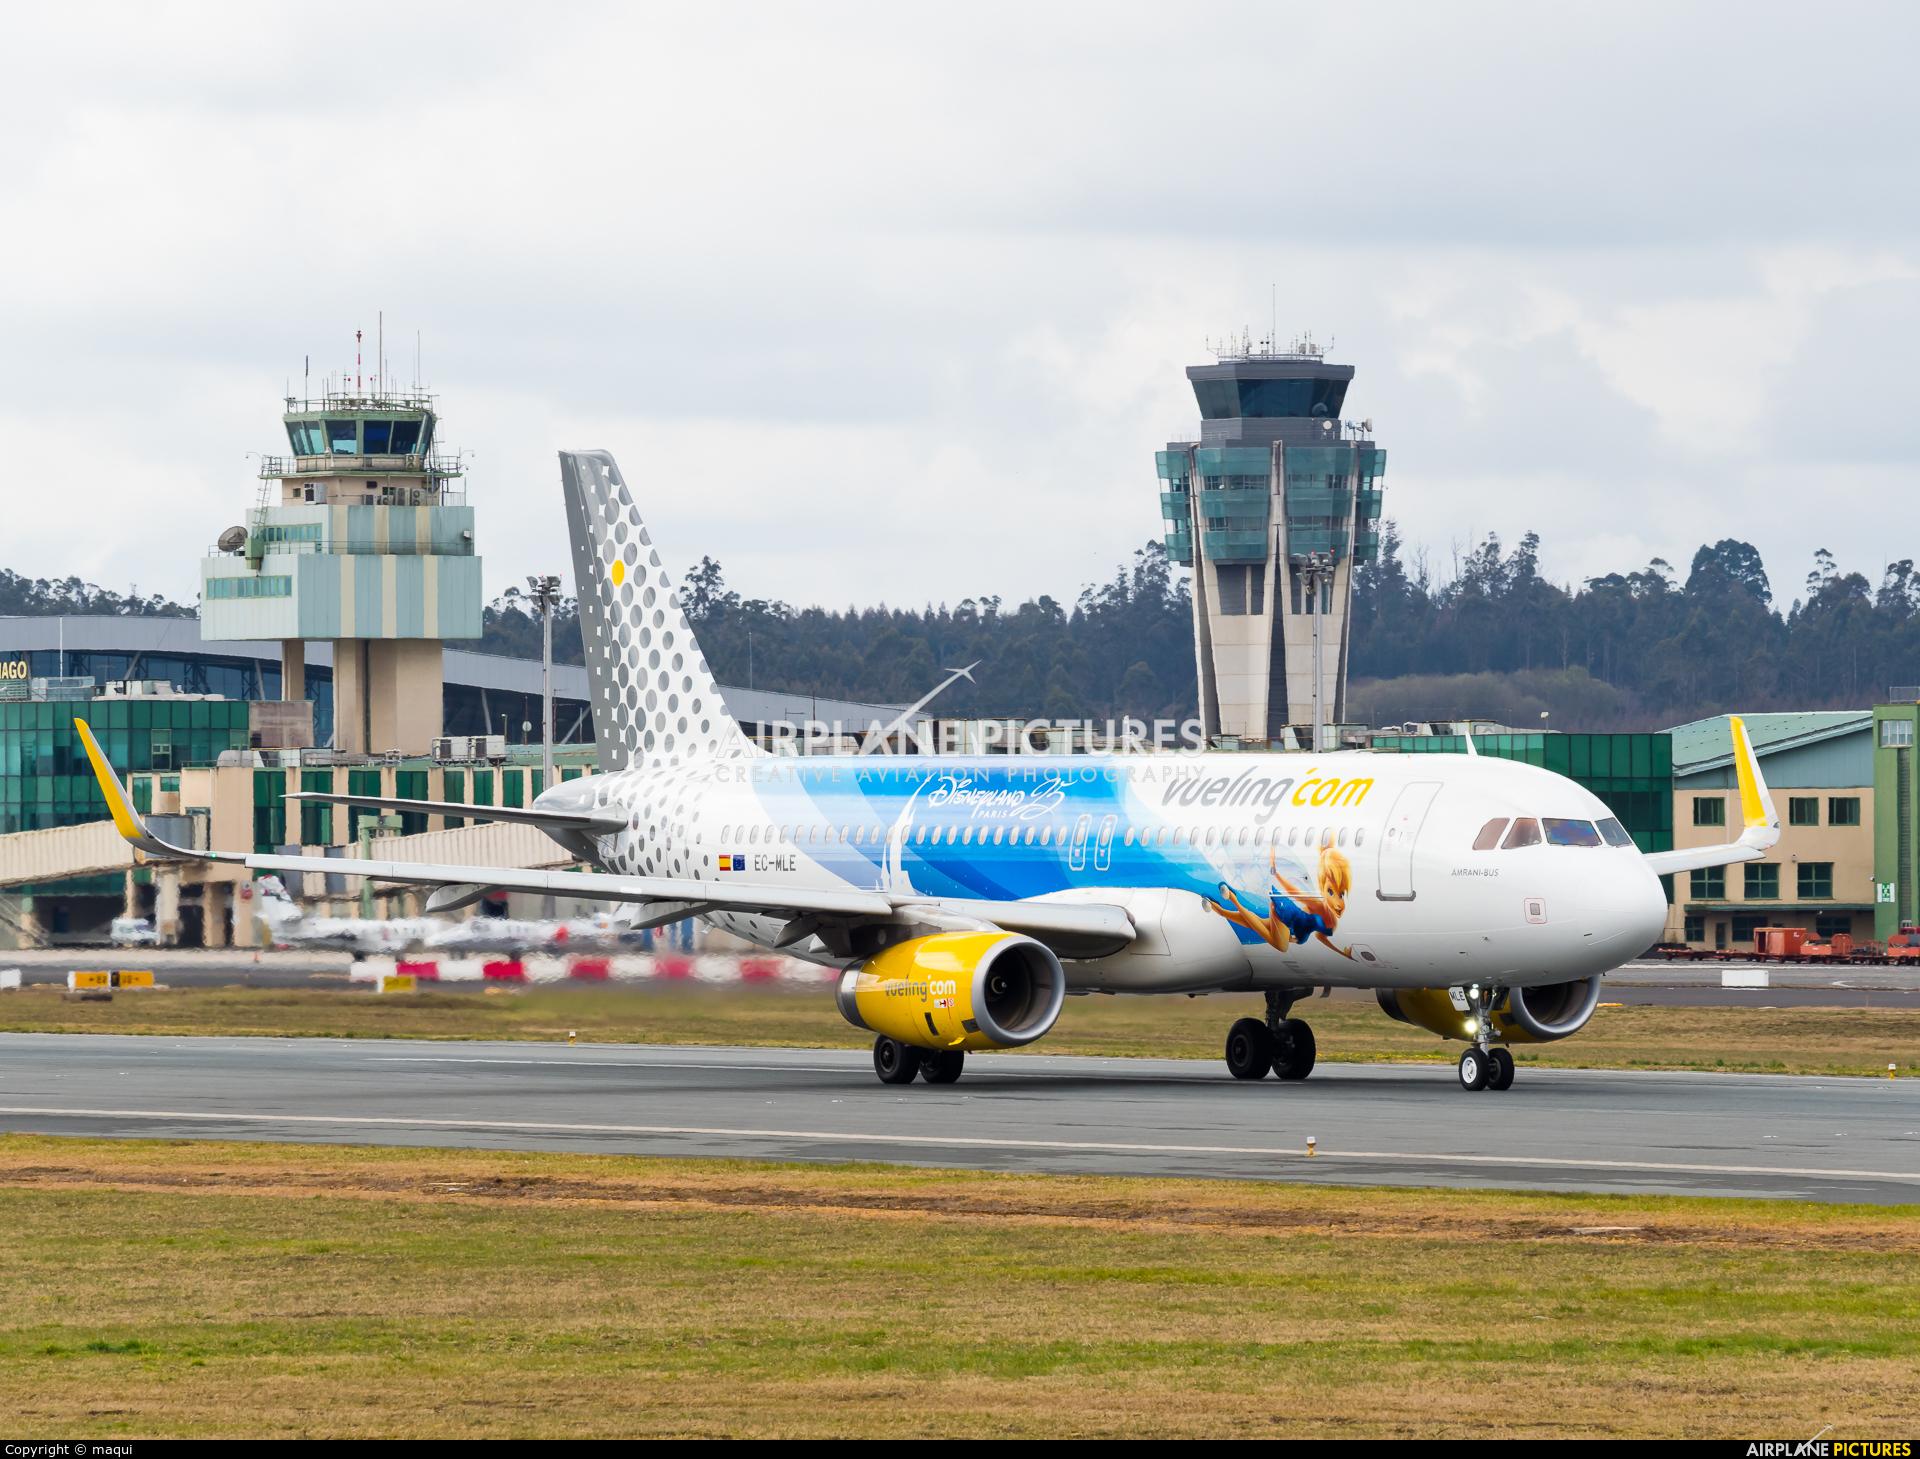 Vueling Airlines EC-MLE aircraft at Santiago de Compostela